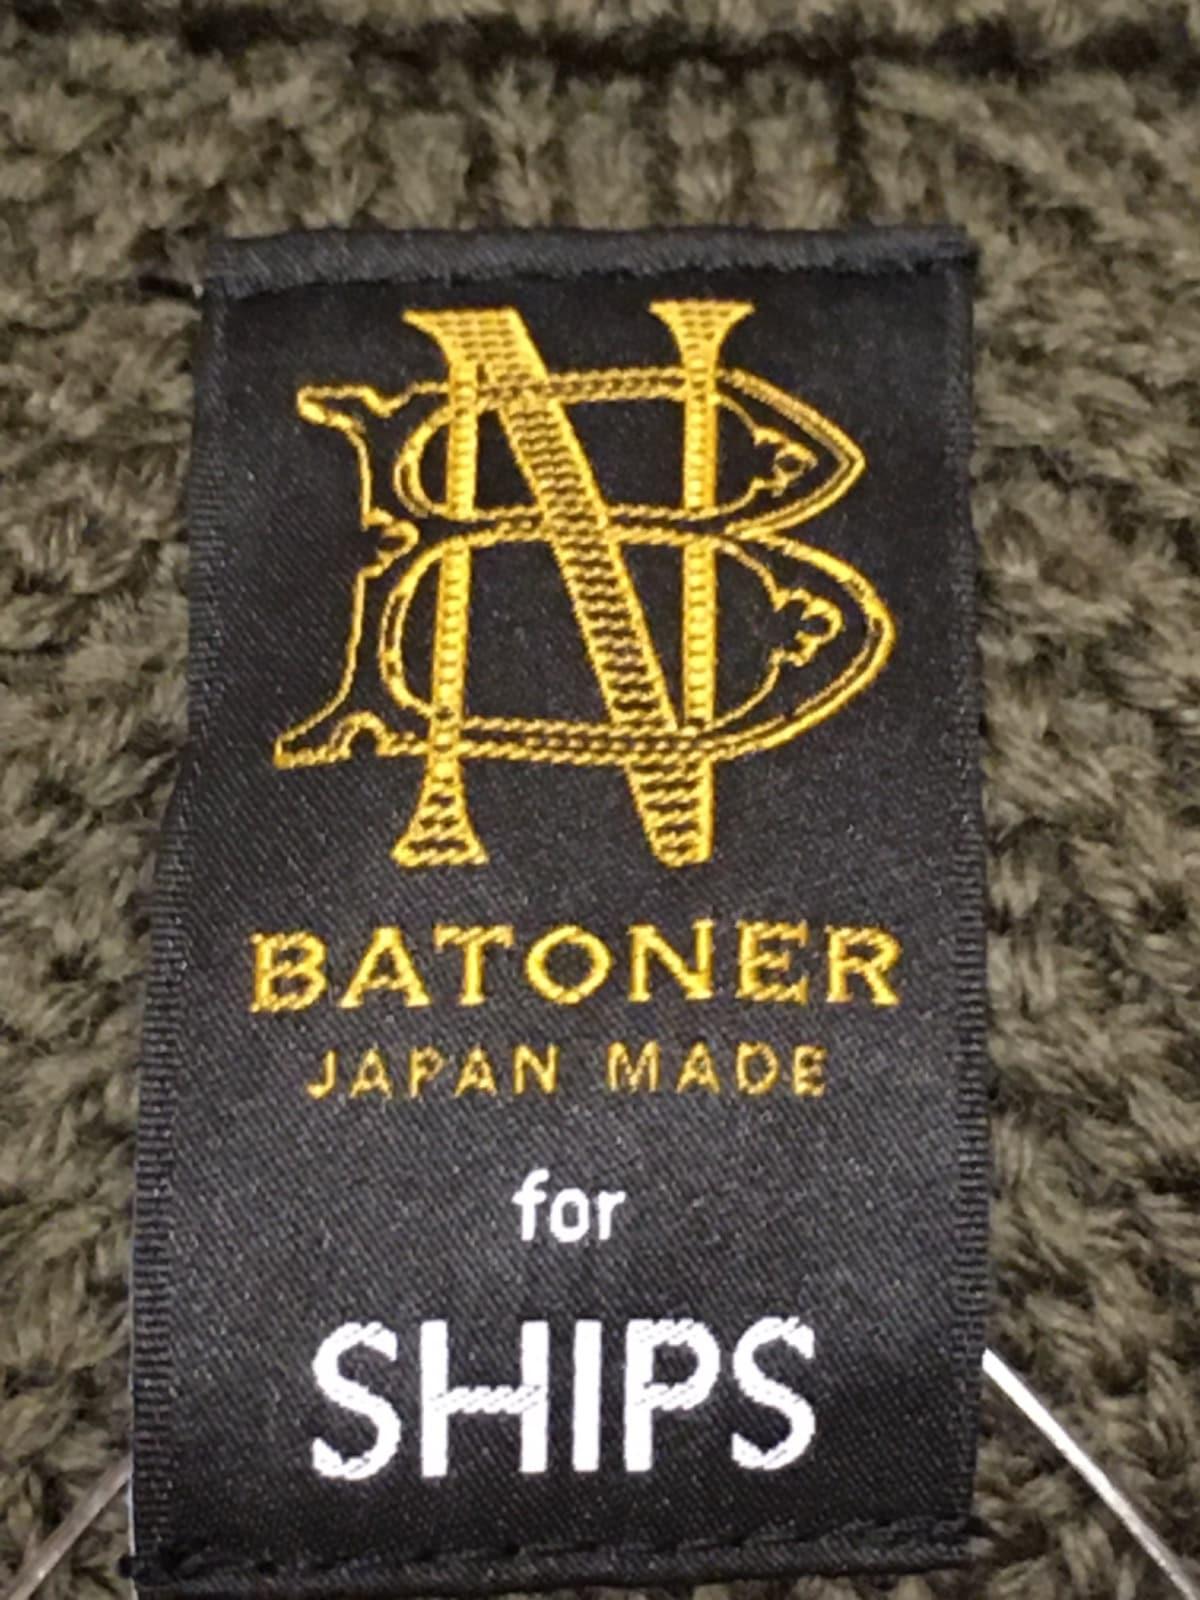 BATONER(バトナー)のブルゾン